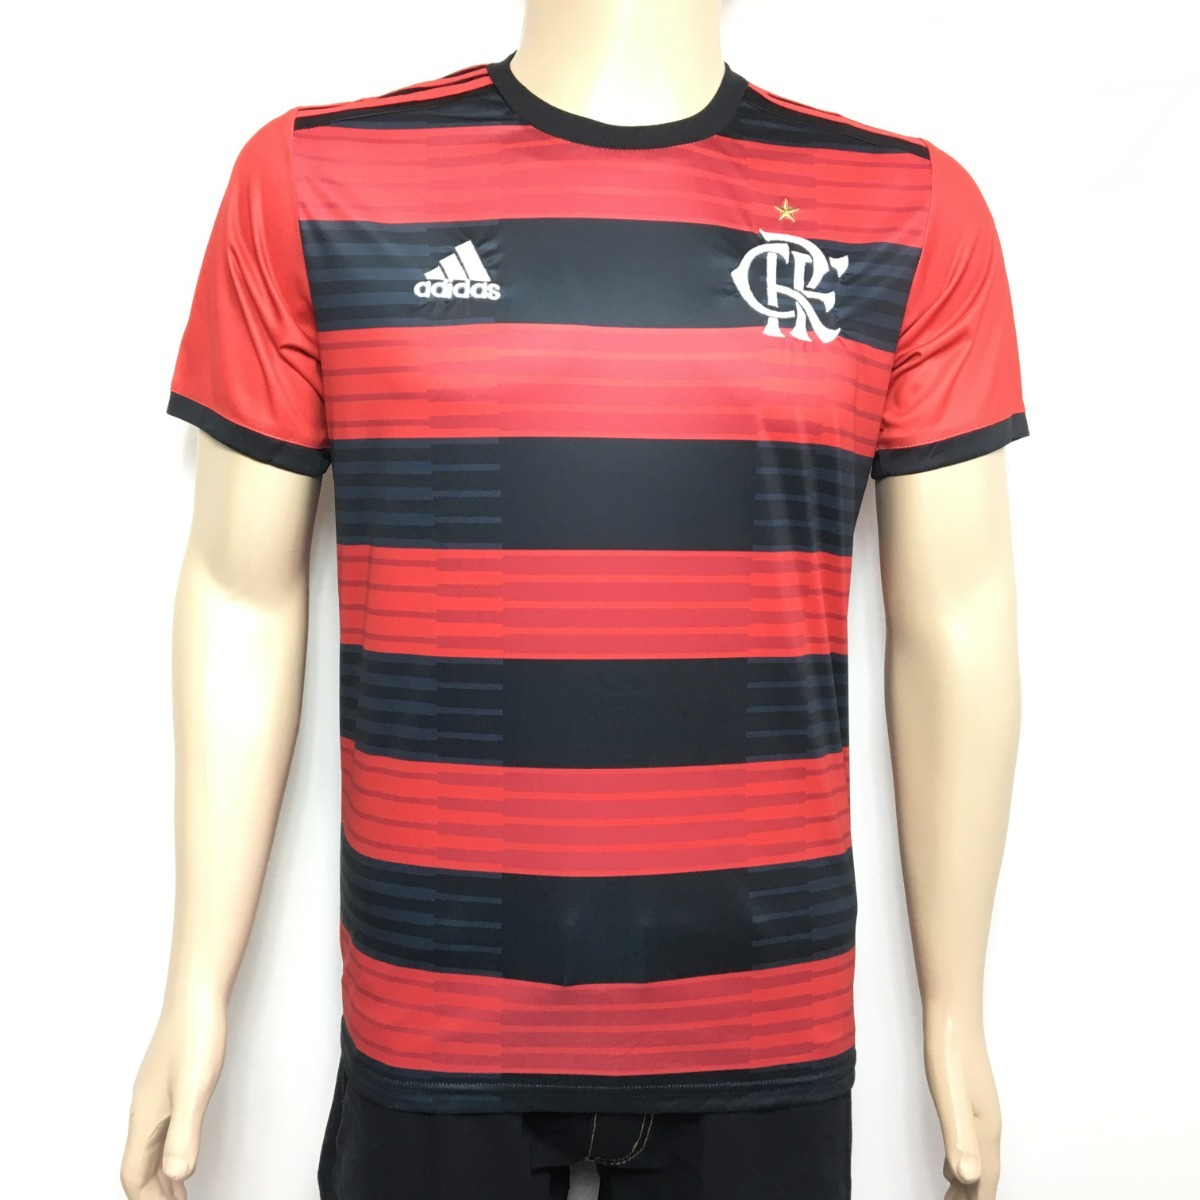 Camisa Time Flamengo adidas 2018 Original Titular - S nº - R  97 8c79decf21778